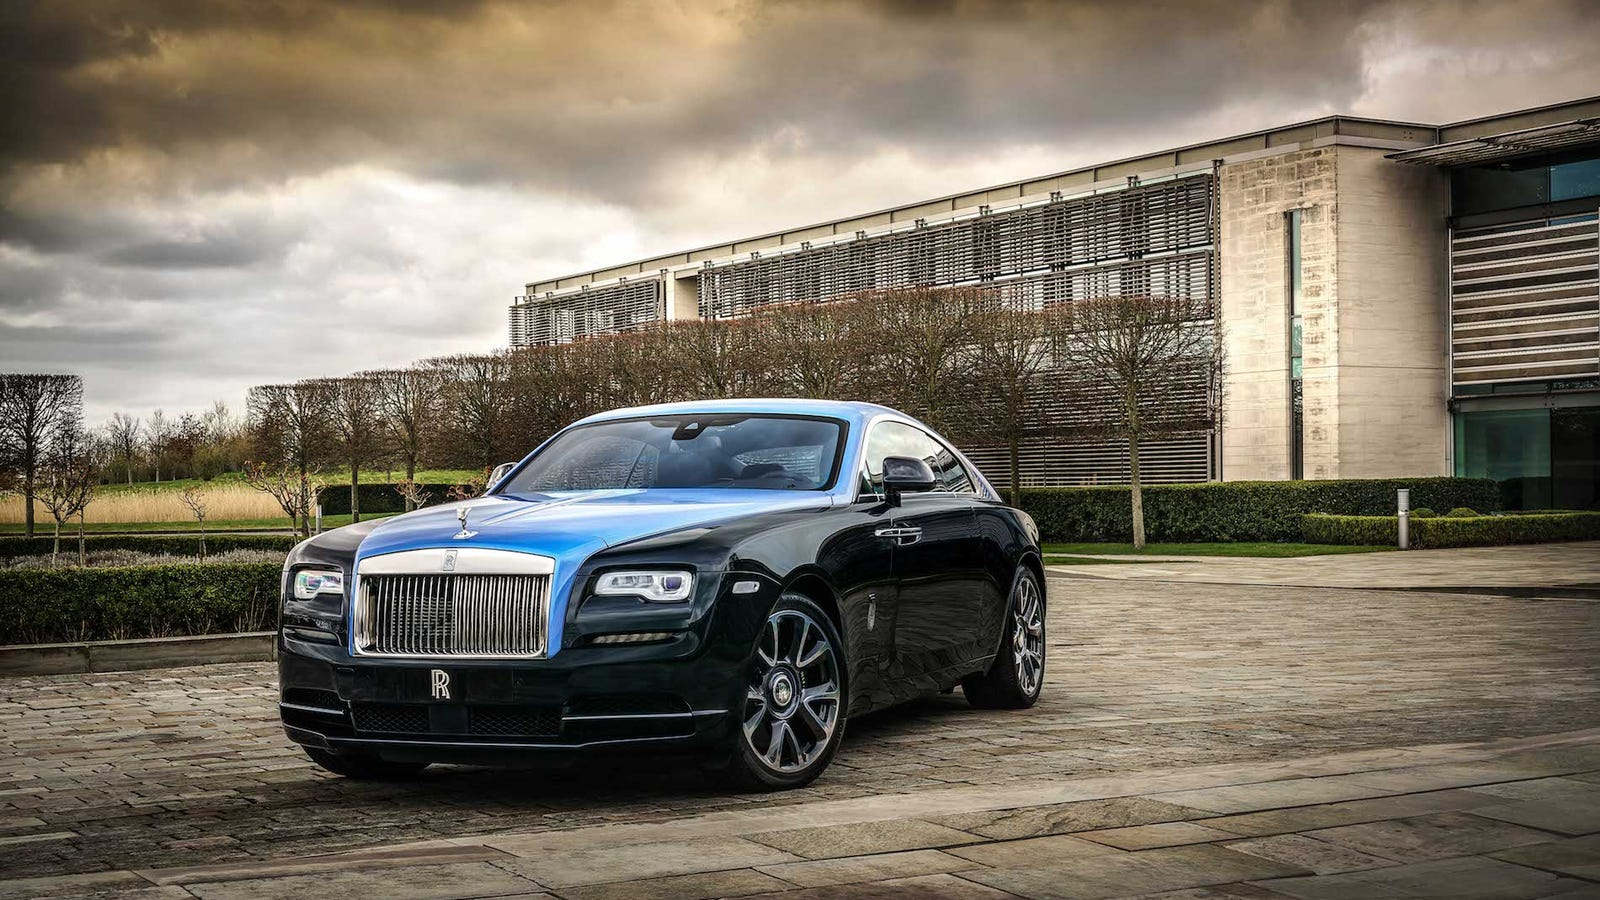 Rolls Royce Electric Car Price